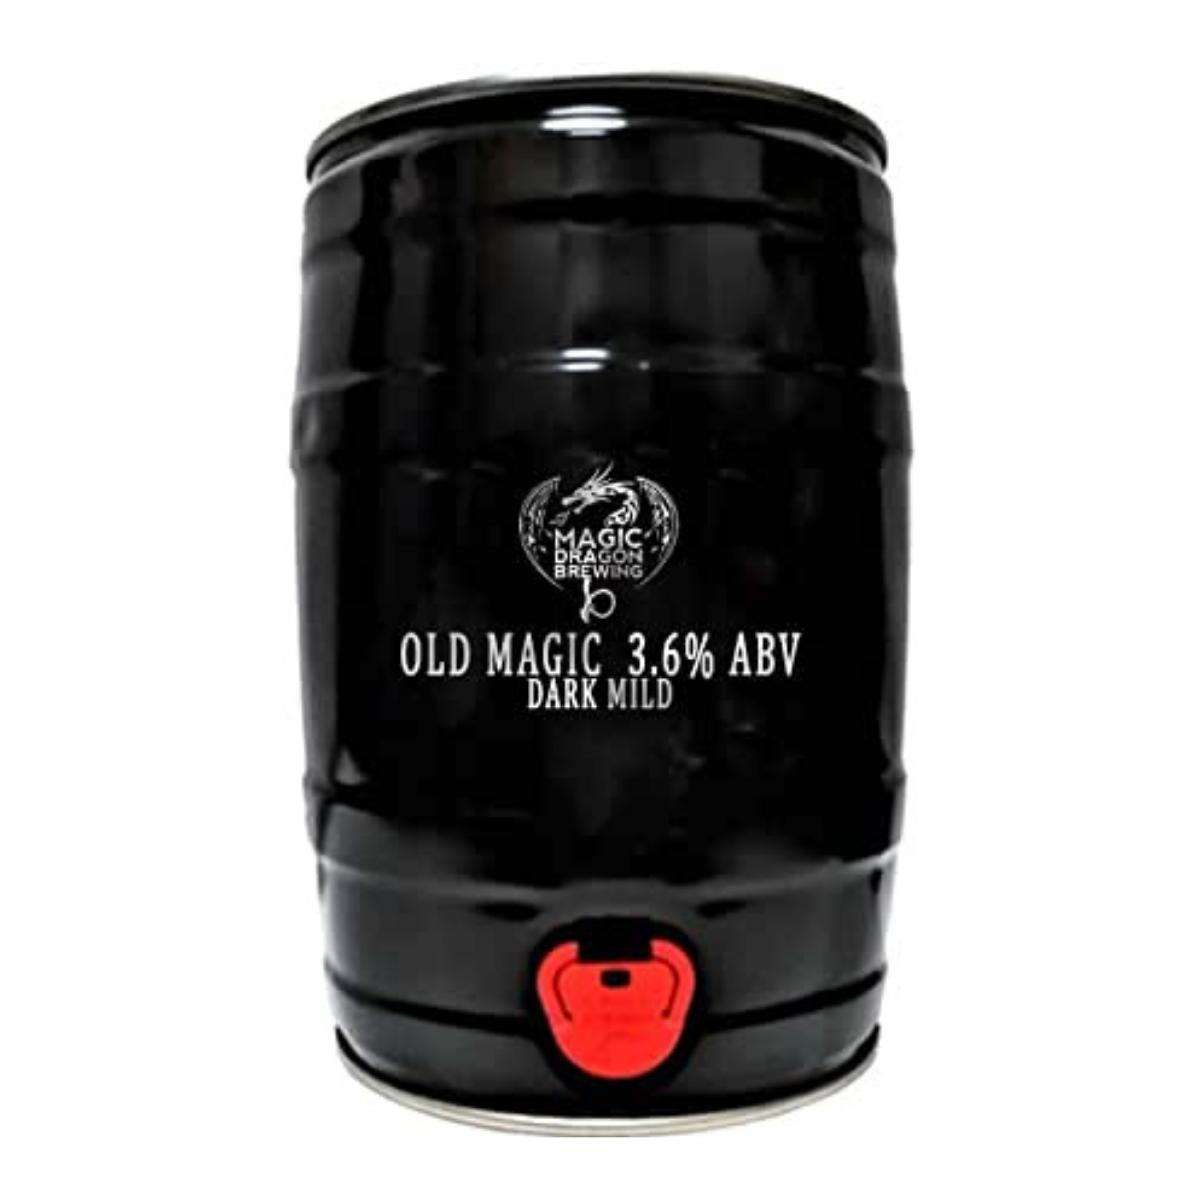 Dark Mild Cask Ale In A Mini Keg